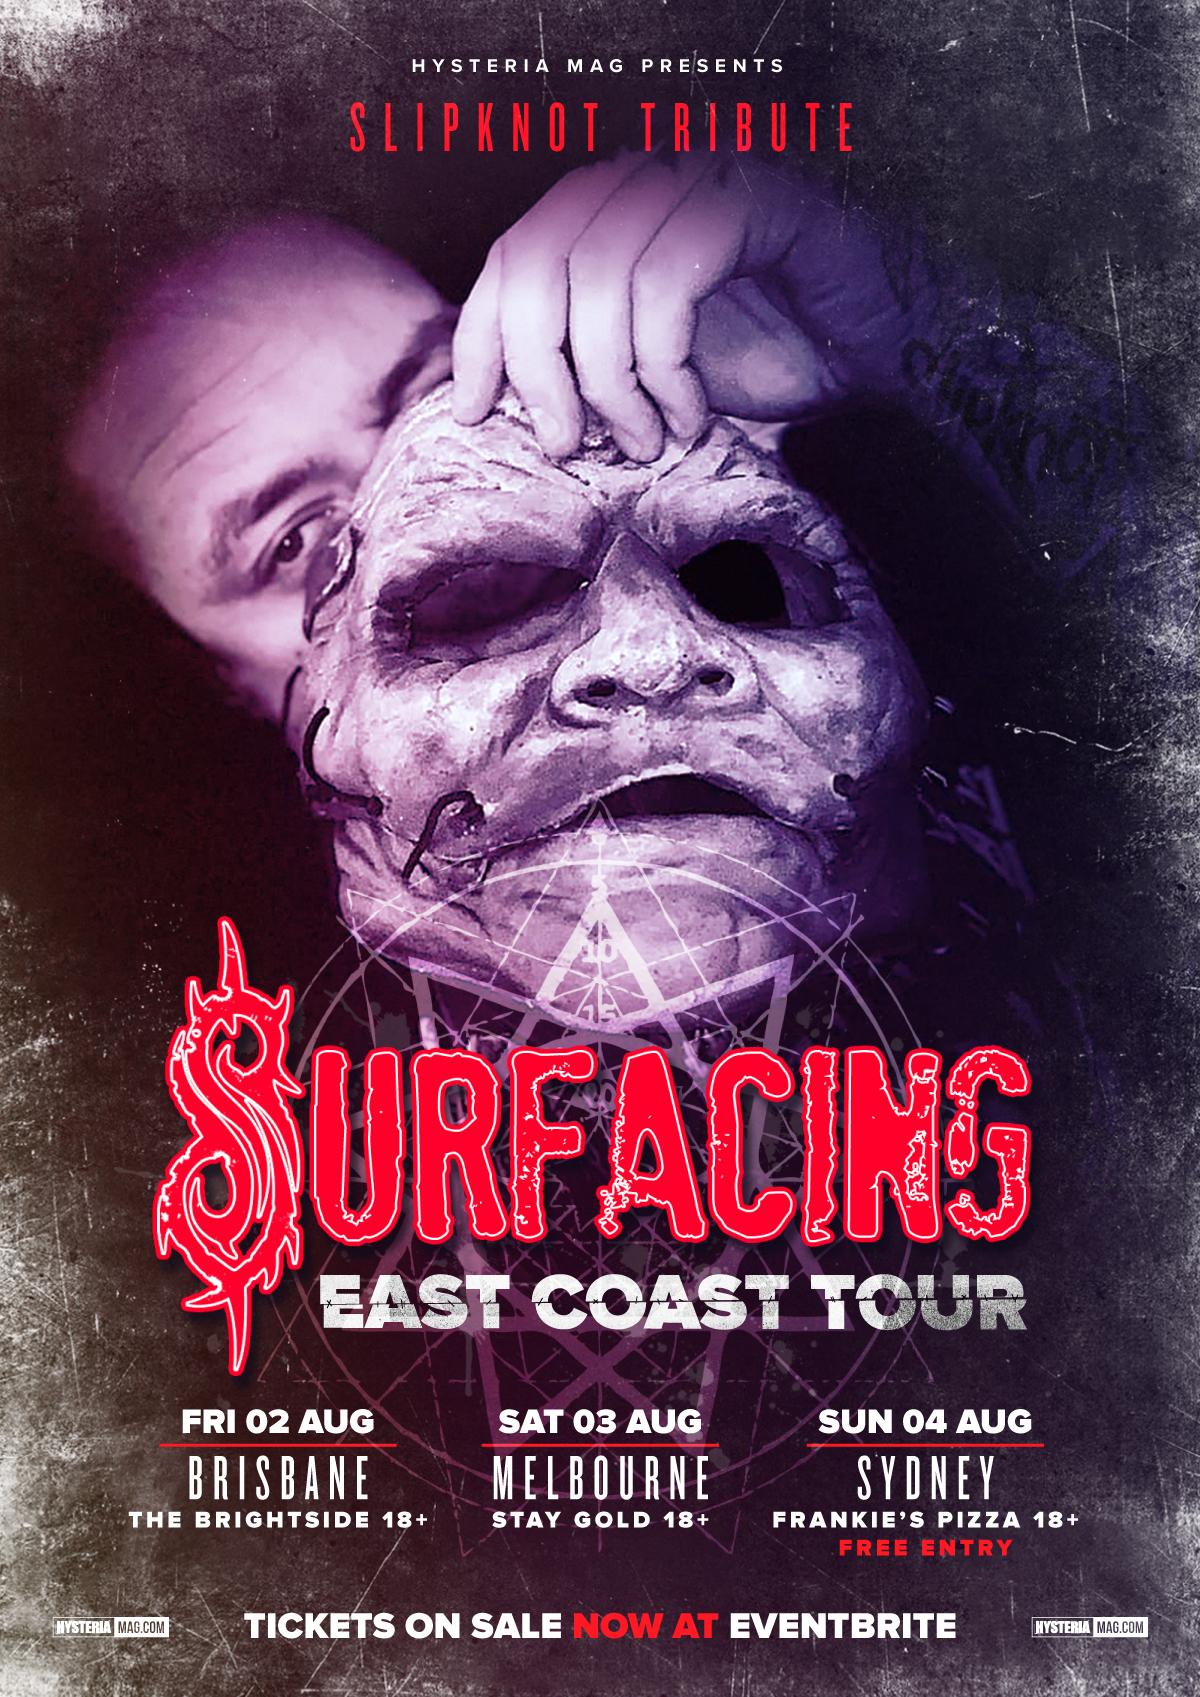 Surfacing (Slipknot Tribute) East Coast Tour